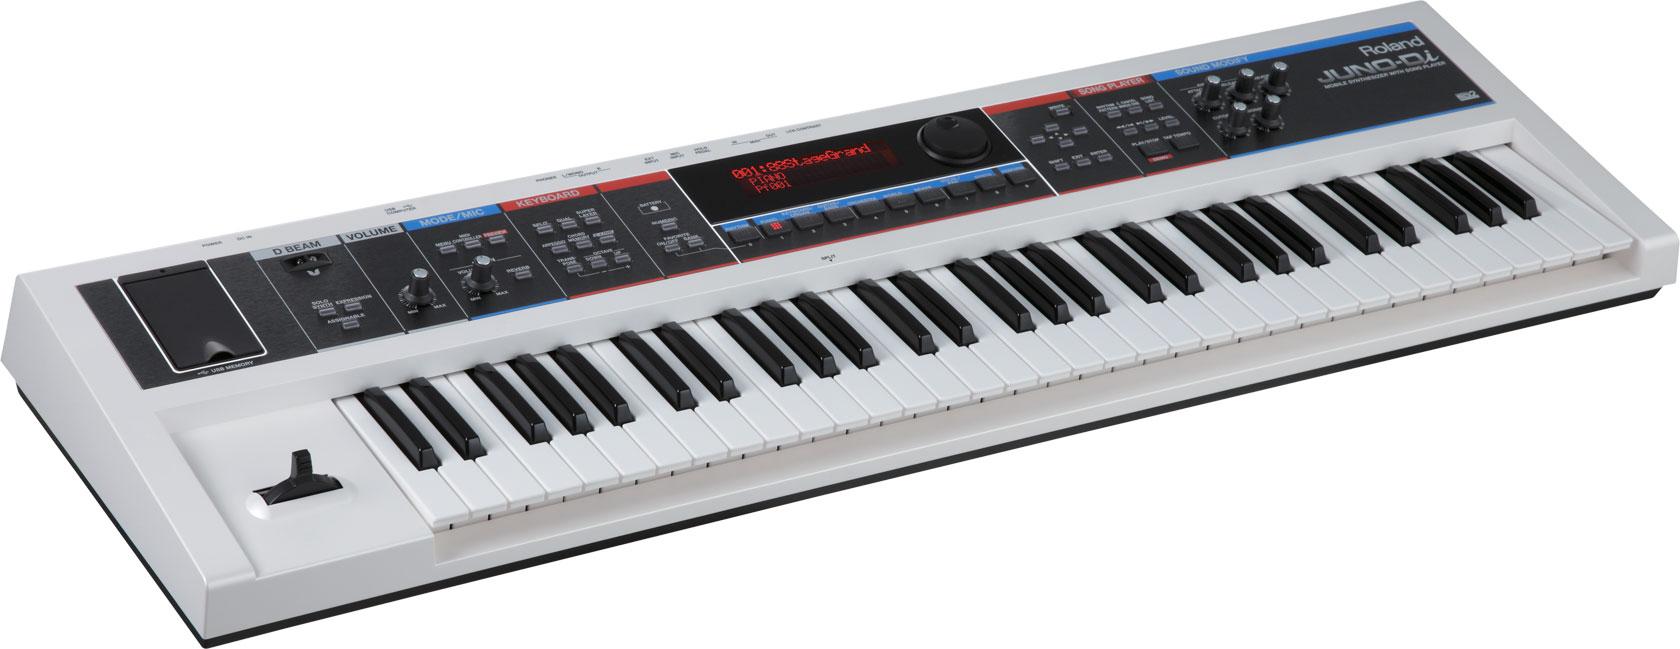 JUNO-Di Roland Juno Keyboards